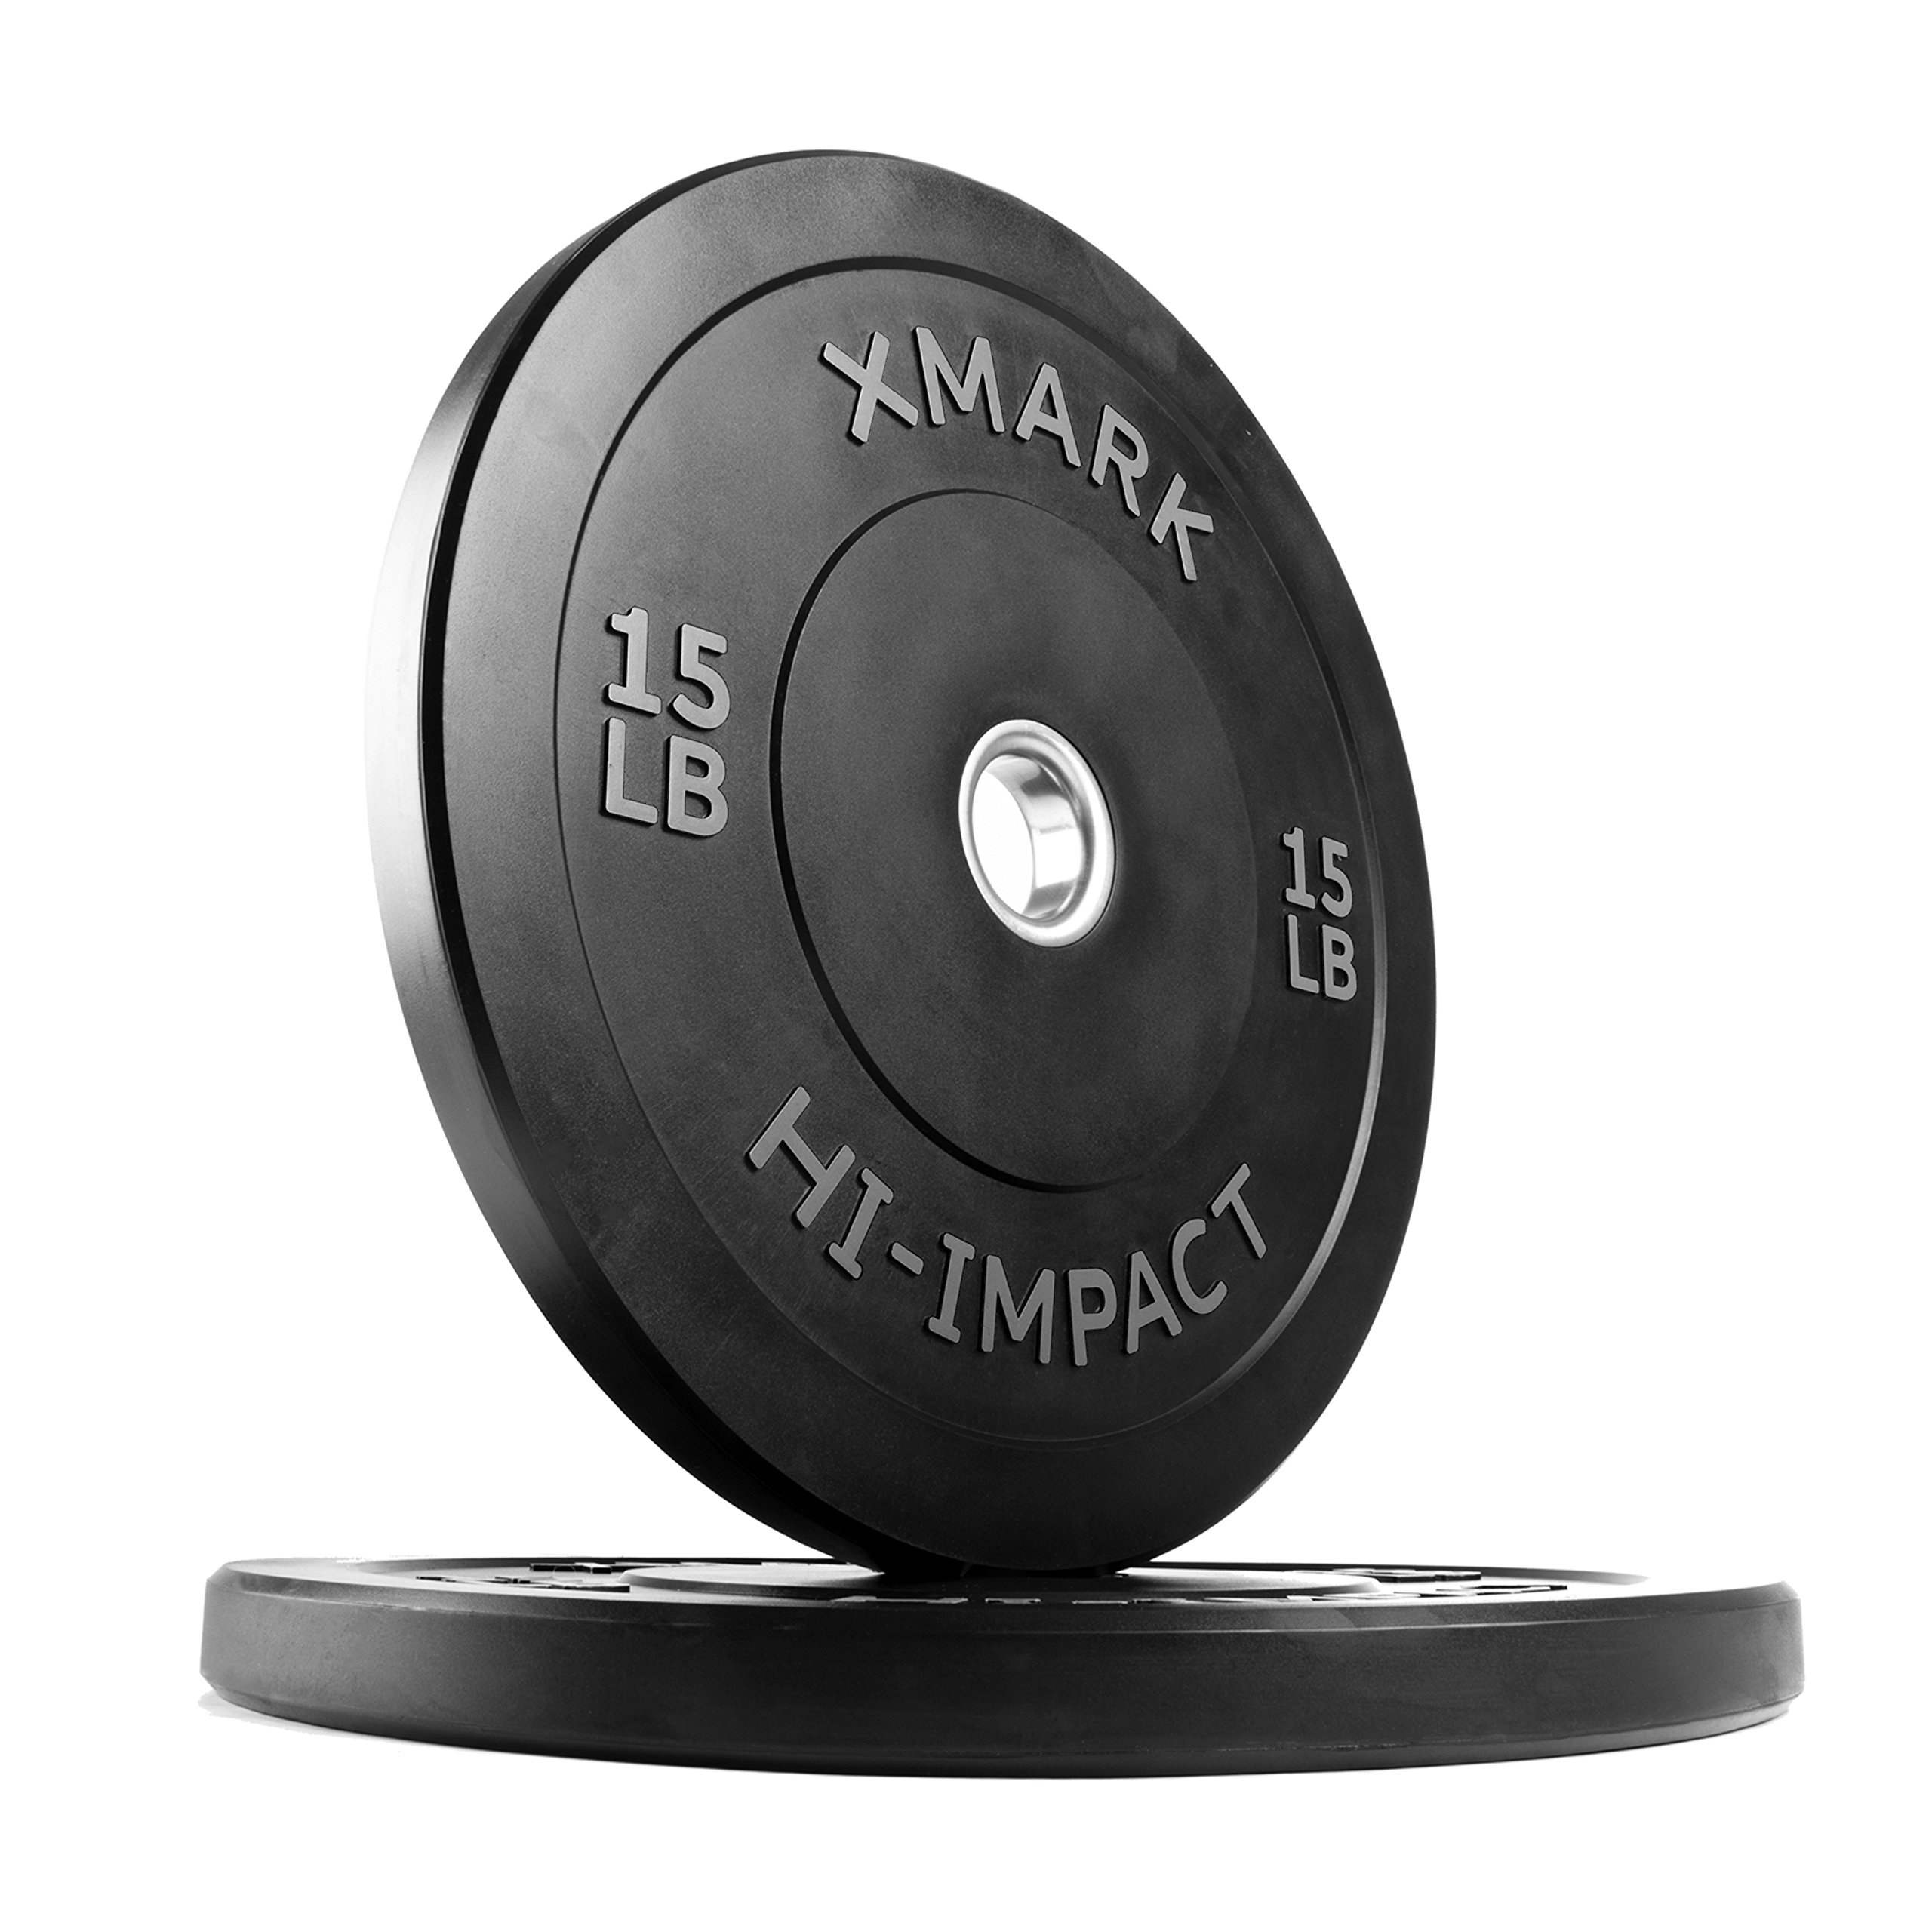 XMark 15 lb Pair Hi-Impact Bumper Plates, Three-Year Warranty, Hi-Impact Dead Bounce Commercial Olympic Bumper Weight Plates, XM-3393